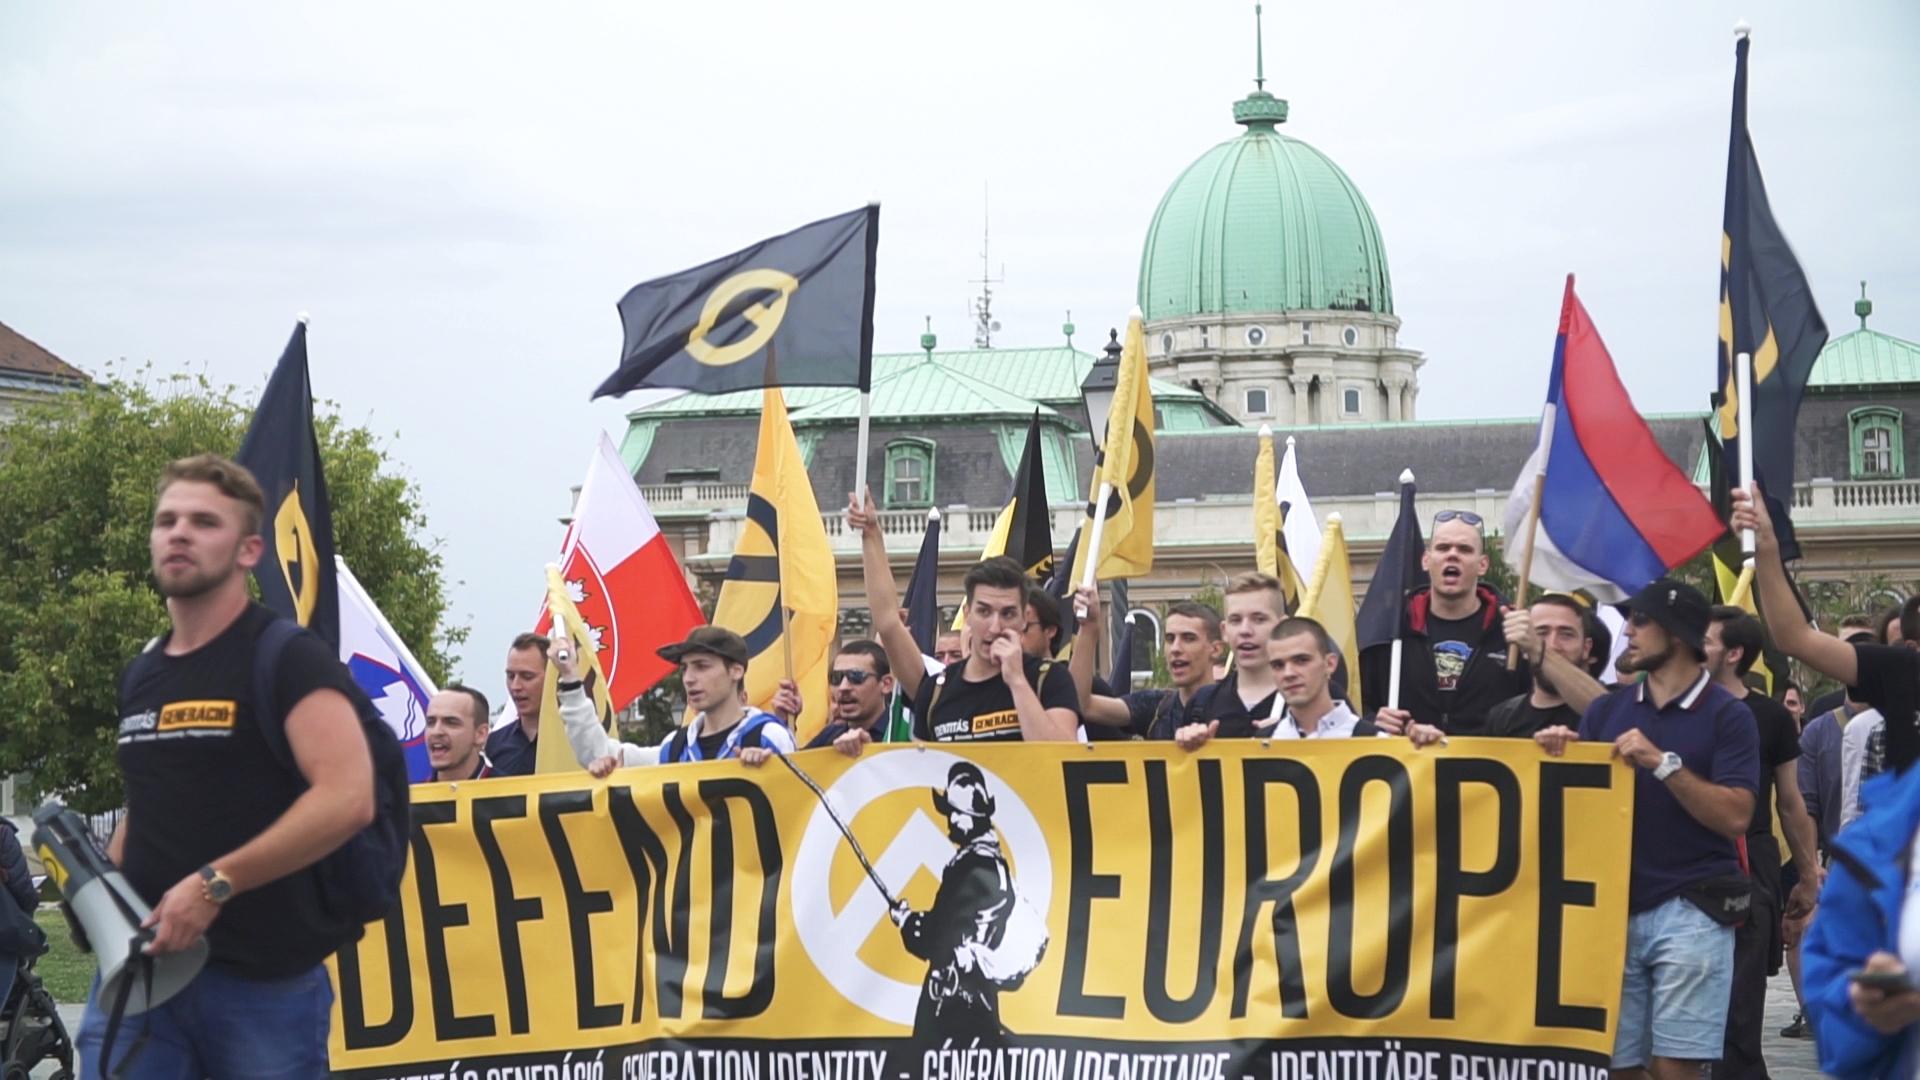 Európa, mármint fehér Európa